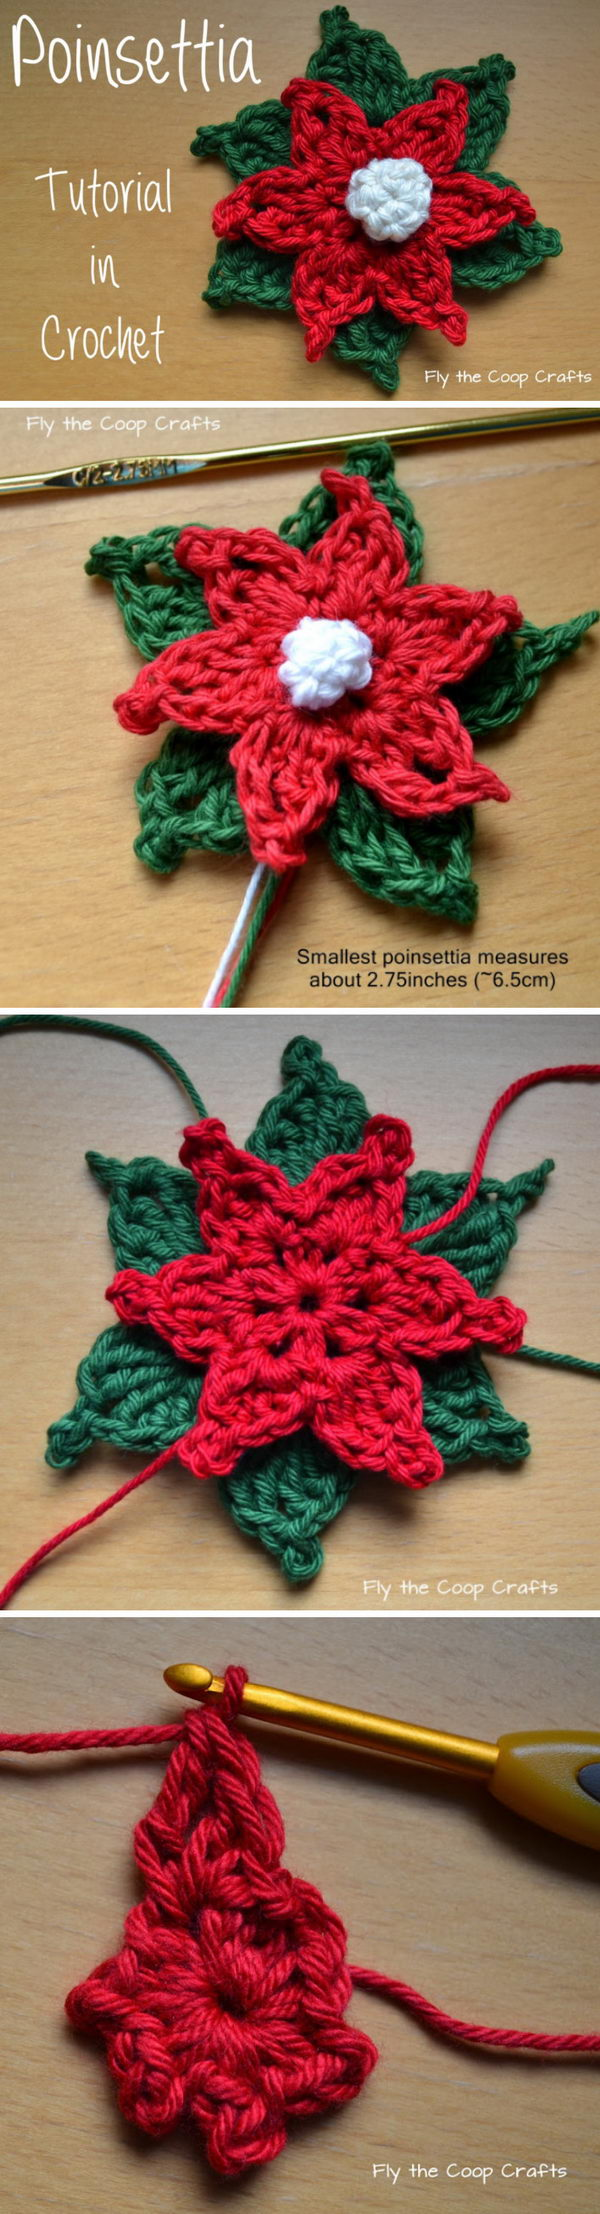 Crochet Poinsettia Motif.